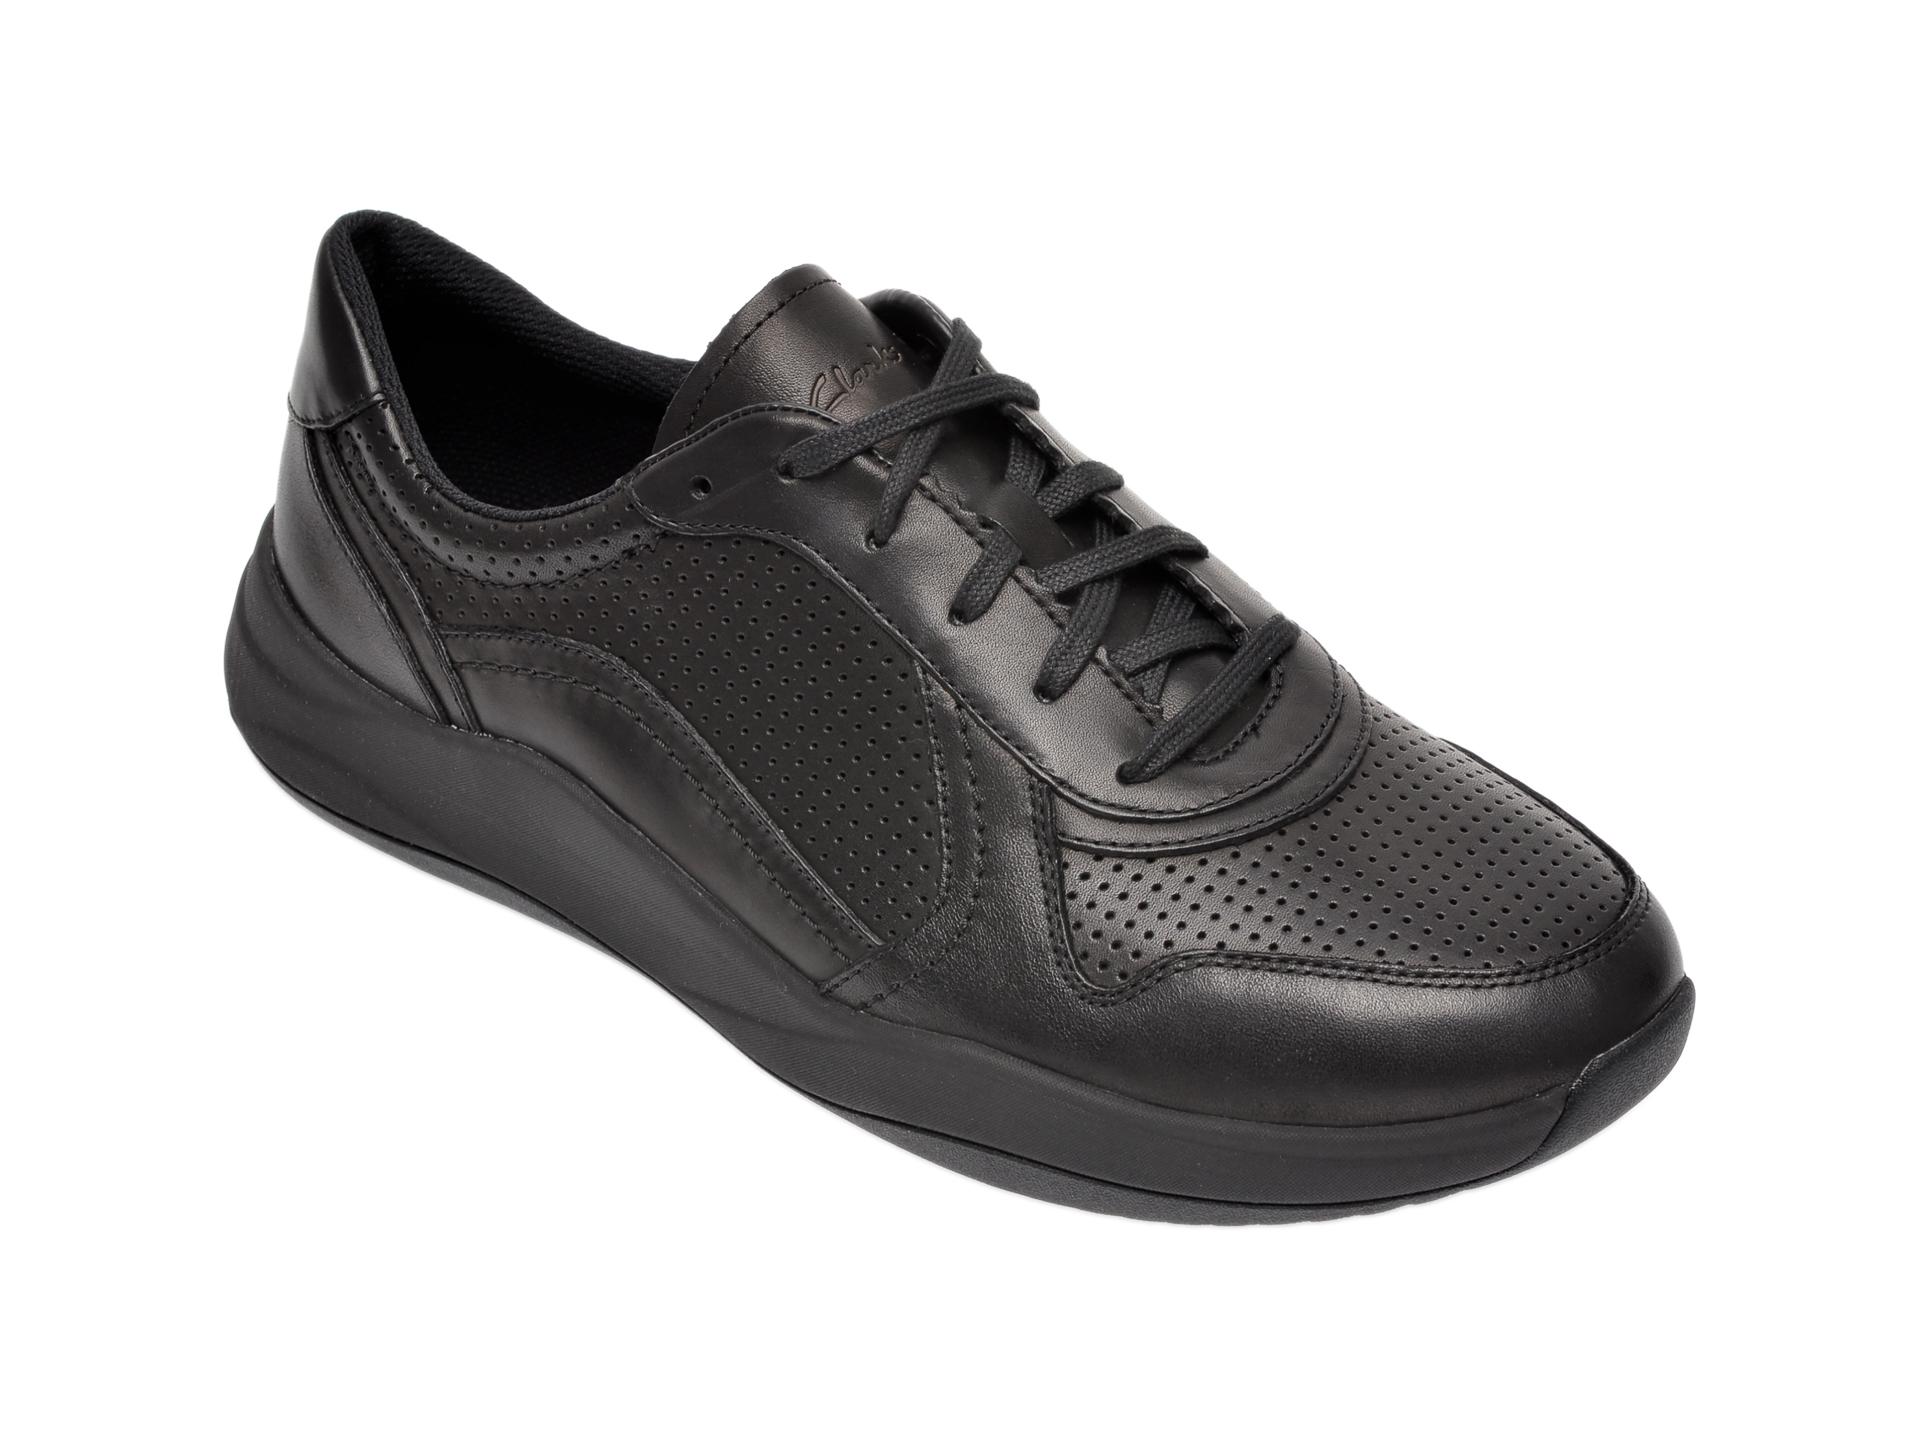 Pantofi sport CLARKS negri, Sift Speed, din piele naturala imagine